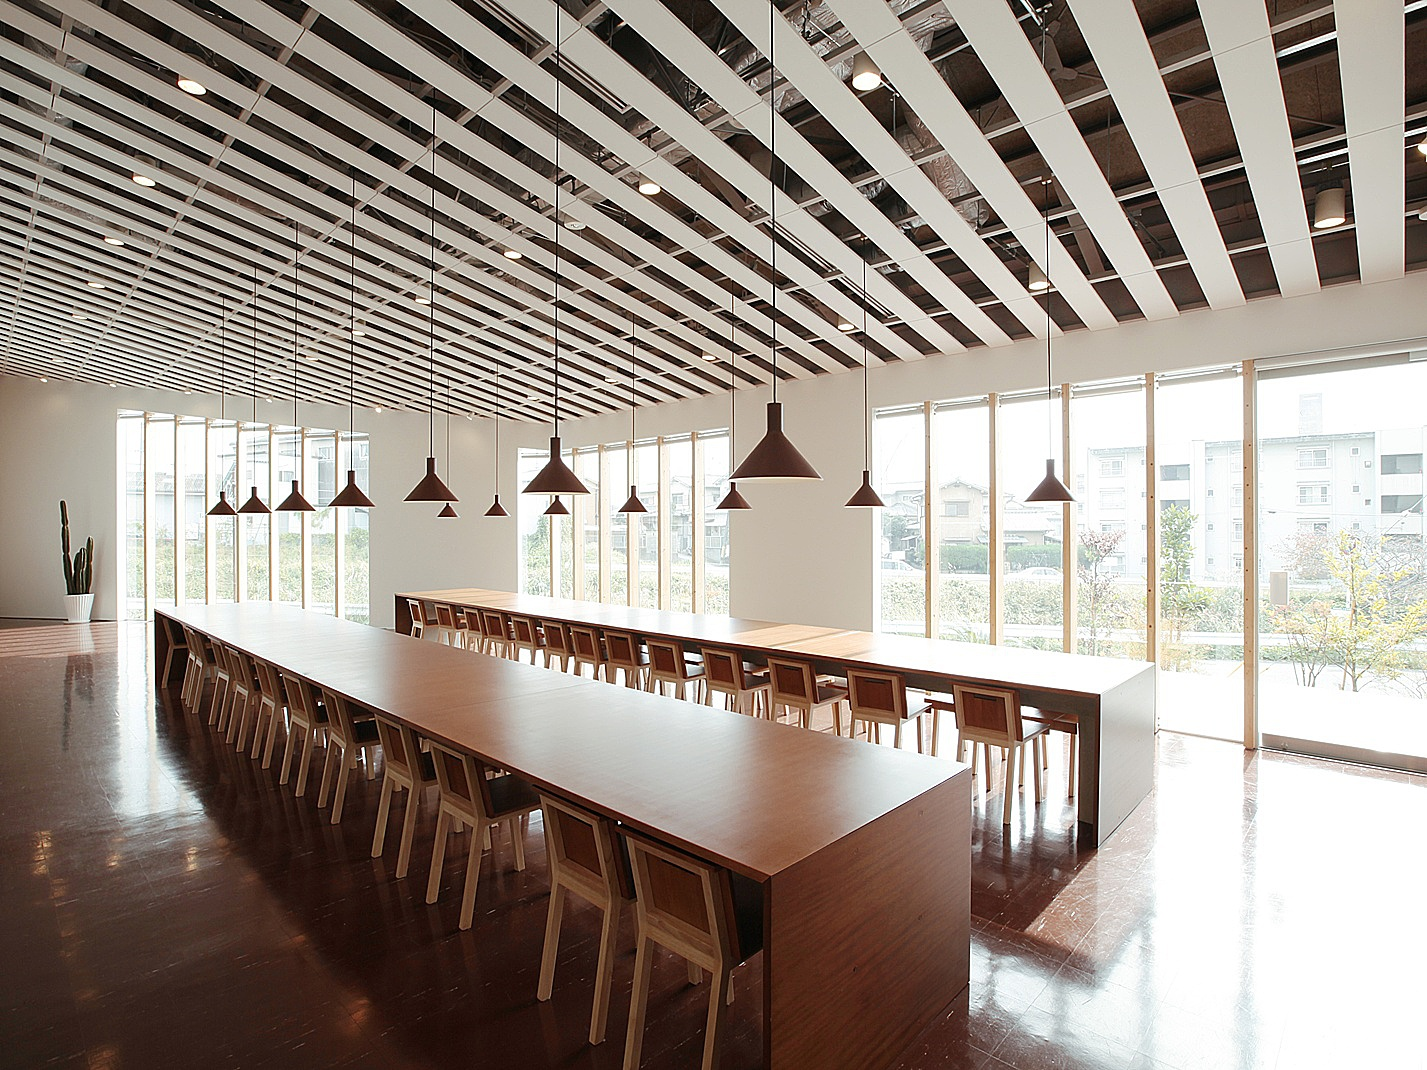 中川政七商店奈良本社の食堂